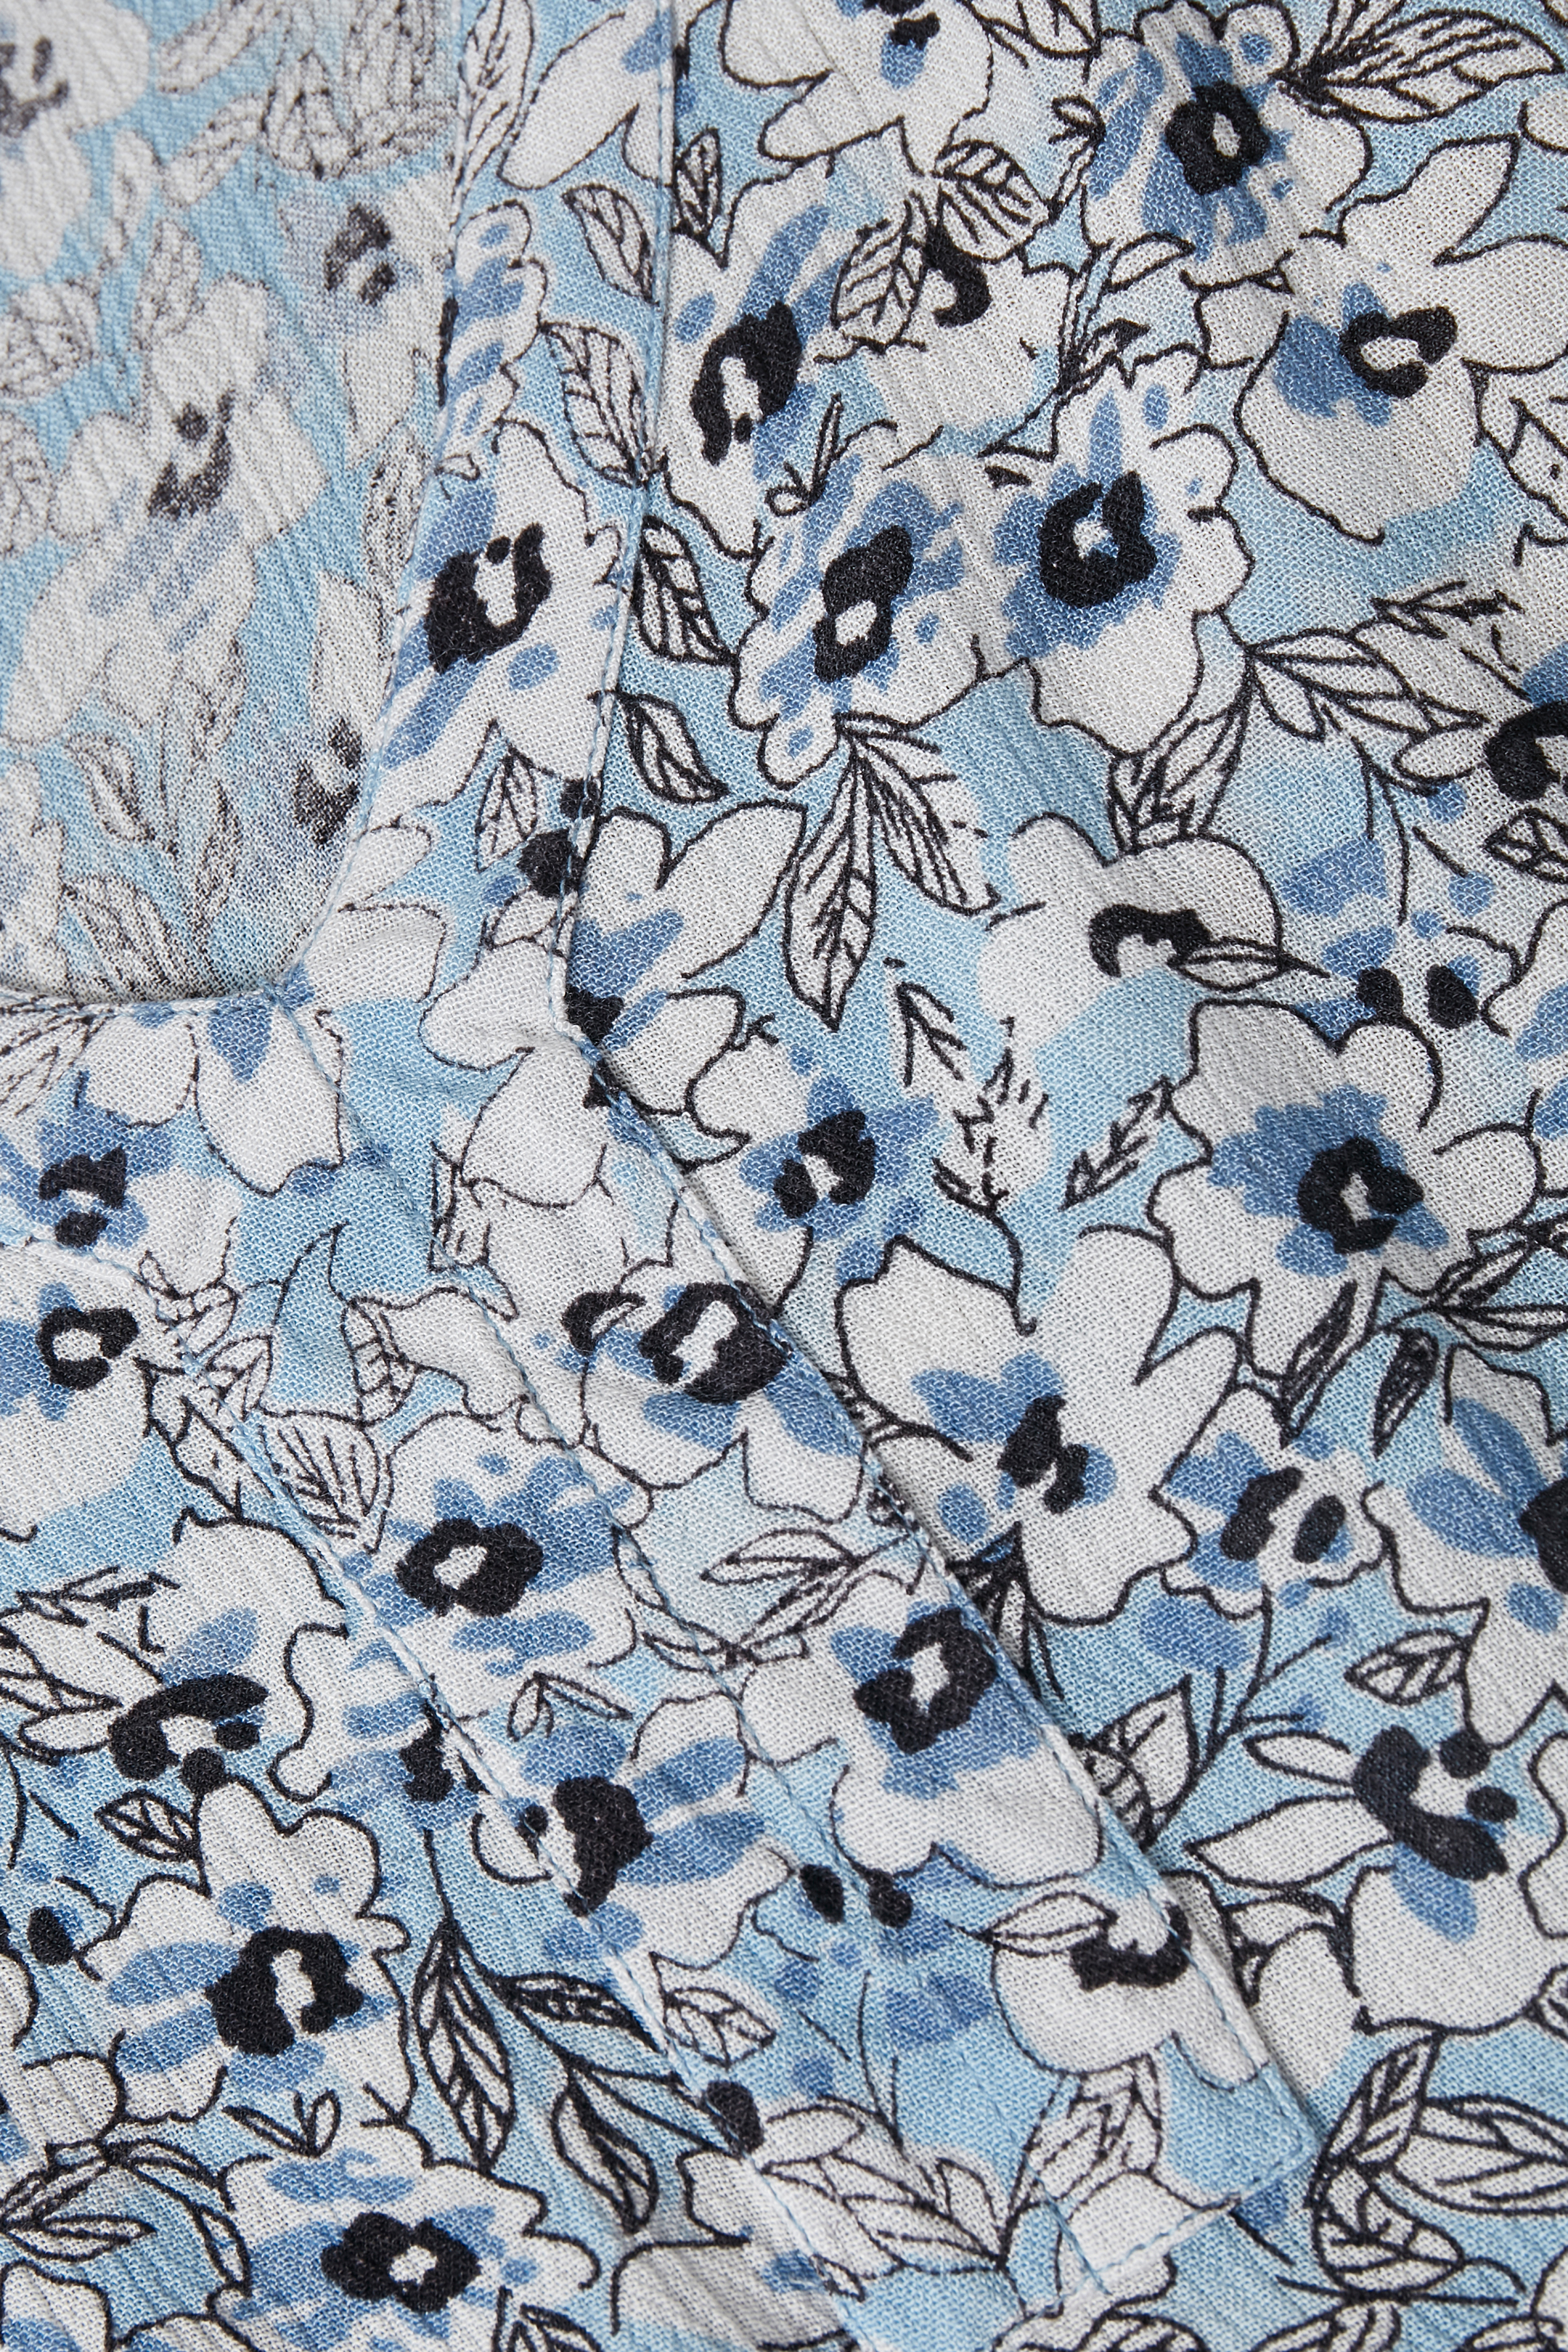 Dimblå/vit Kortärmad blus  från Kaffe – Köp Dimblå/vit Kortärmad blus  från stl. 34-46 här